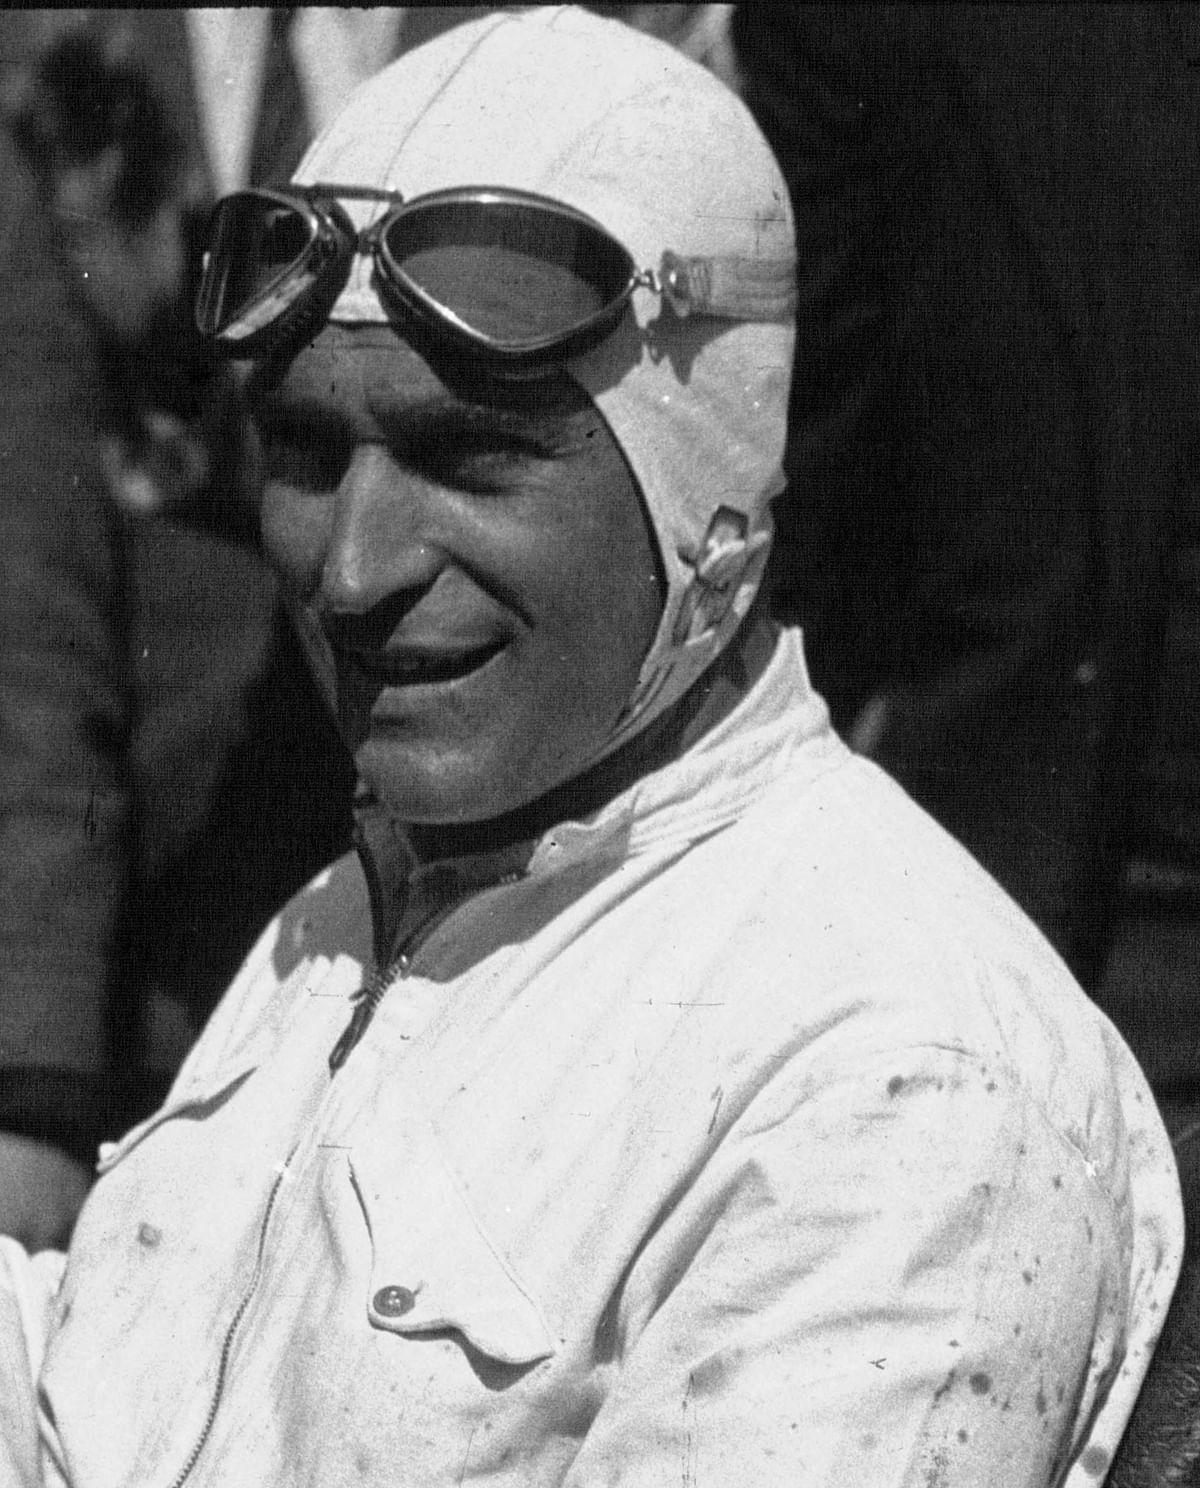 Luigi Fagioli in his Maserati at the 1932 Targa Florio